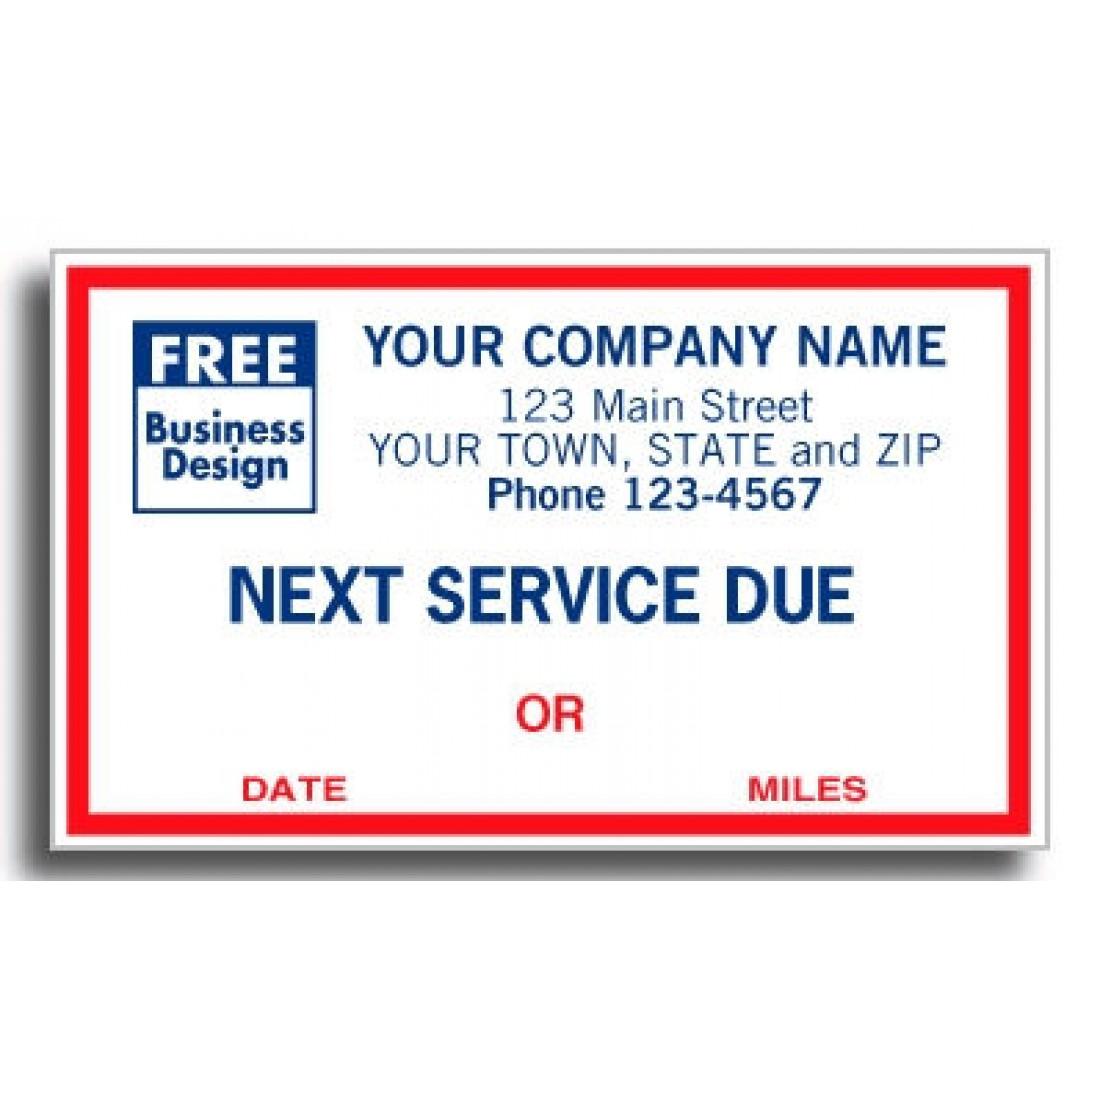 Service due sticker labels